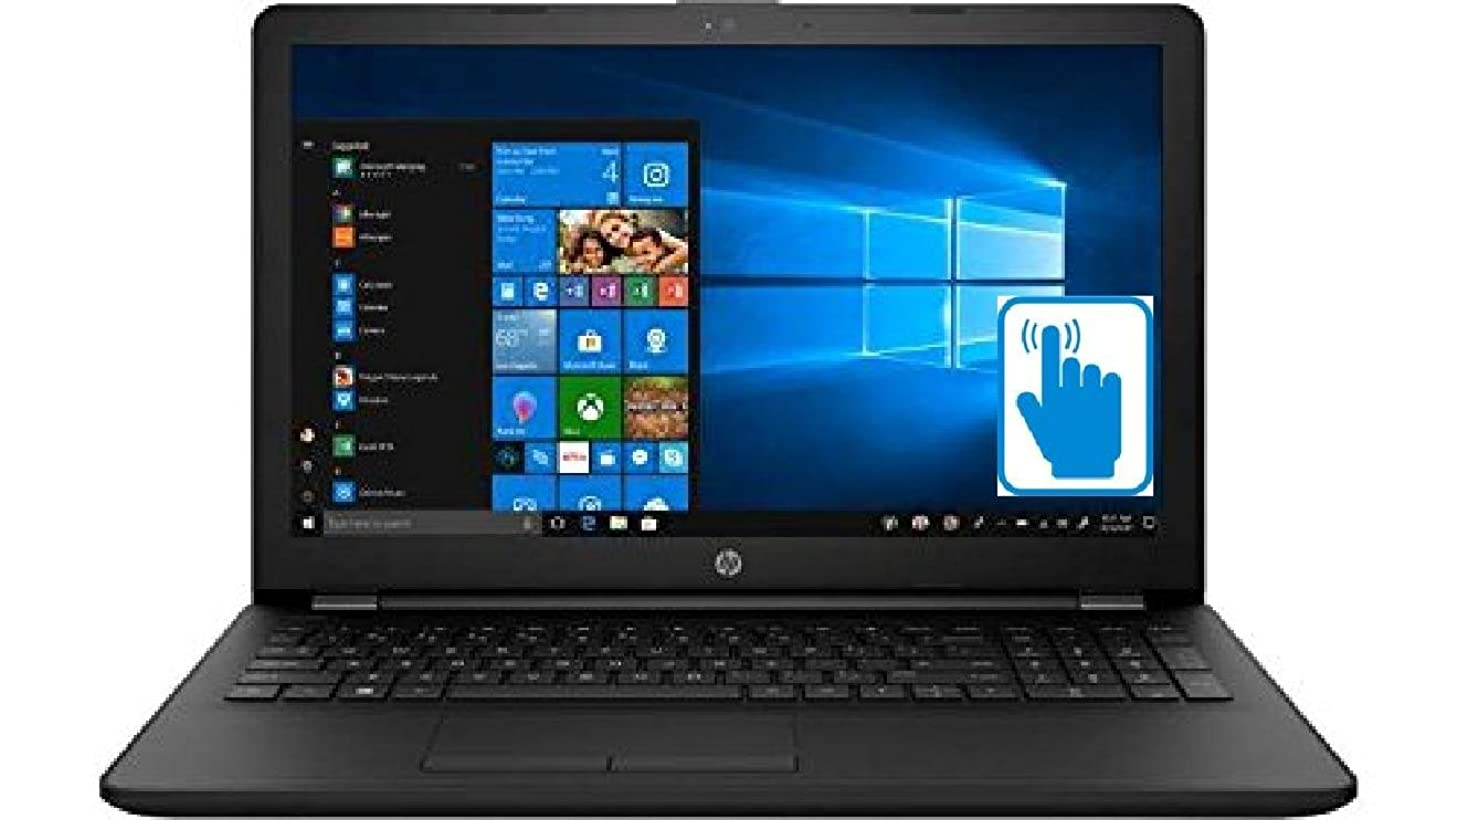 HP High Performance 15.6 inch Touchscreen Laptop (Intel i3-7100U Processor, 16GB RAM, 1TB HDD + 512GB SSD, 15.6